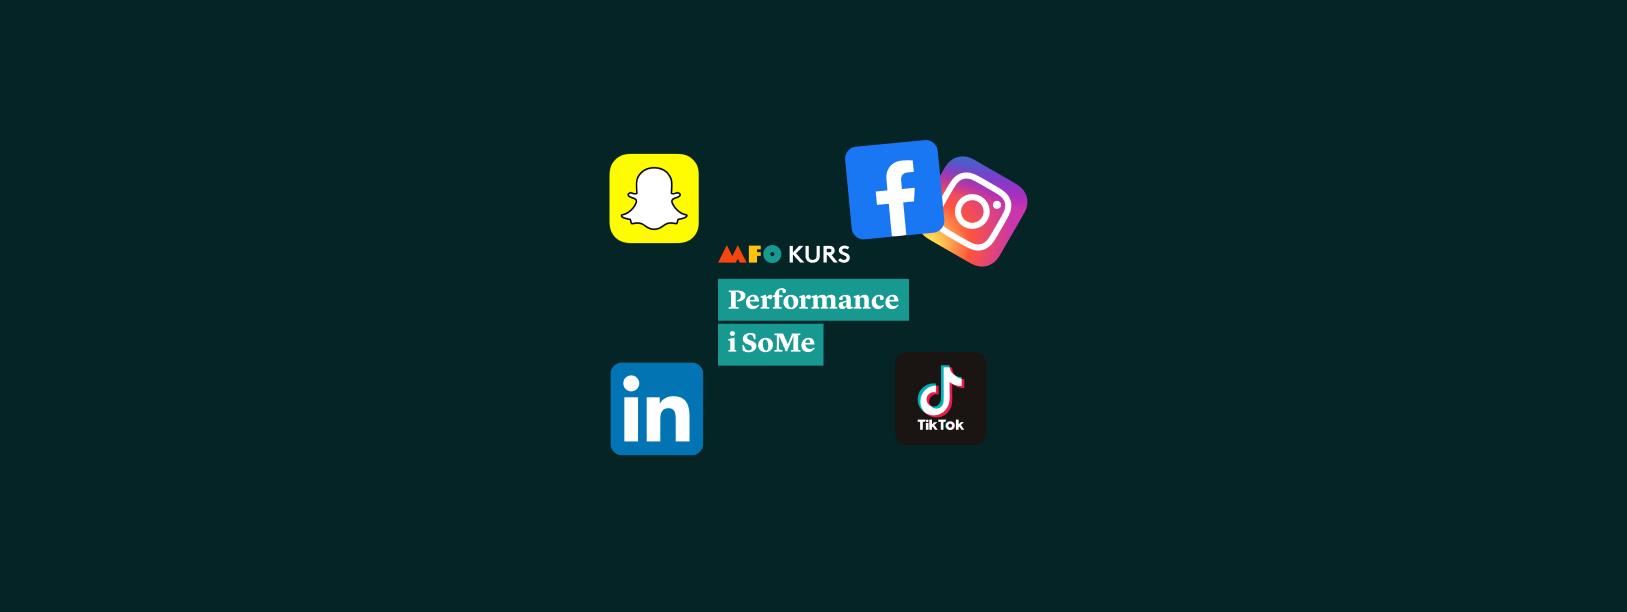 mfo-kurs-performance-header-1627x612